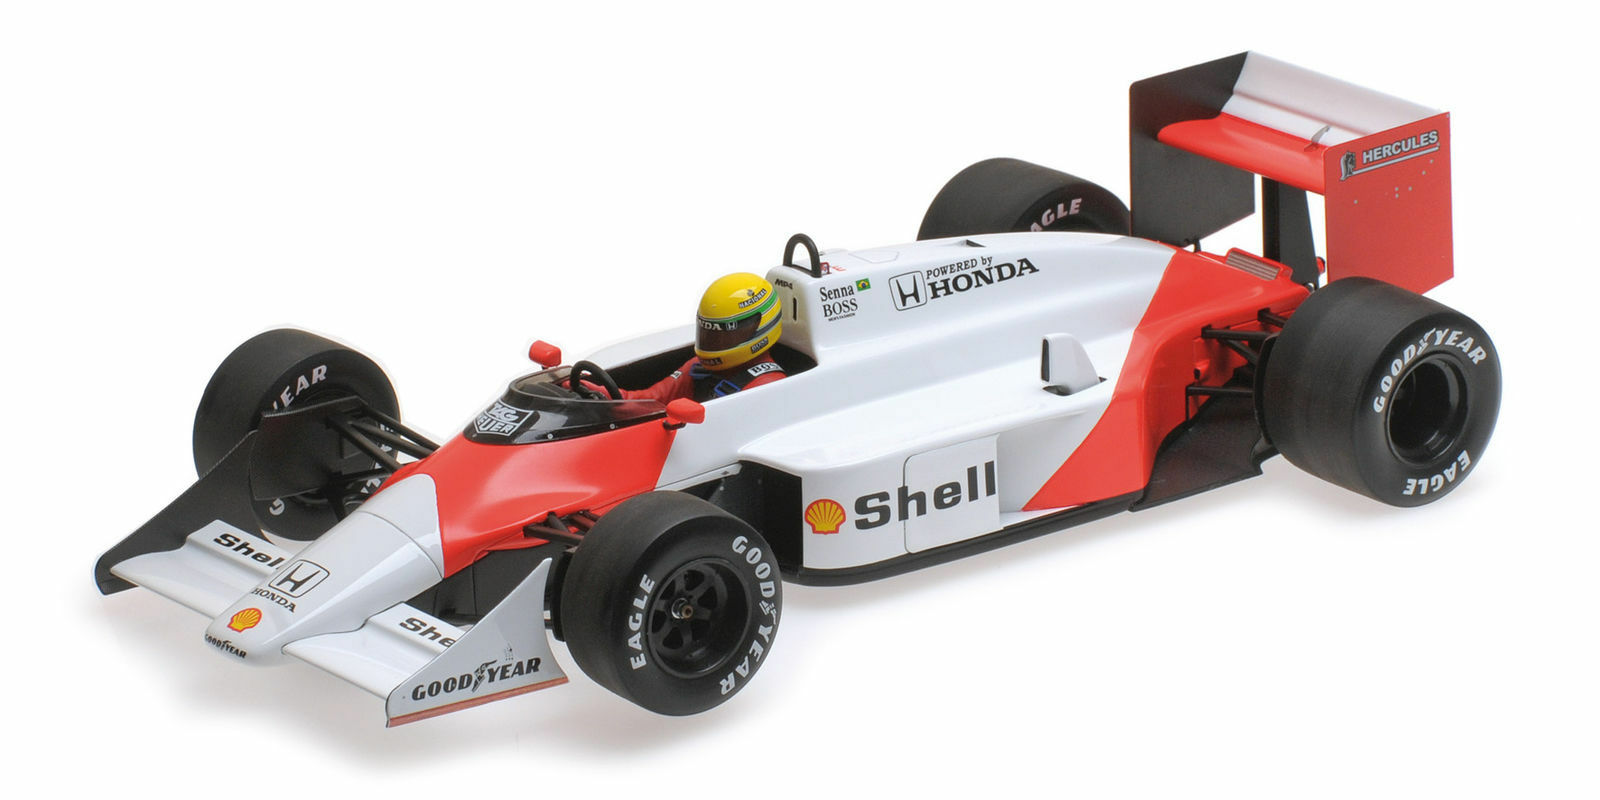 Minichamps 547871899 1 18 1987 McLaren MP4 3 Ayrton Senna Test Car F1 Model